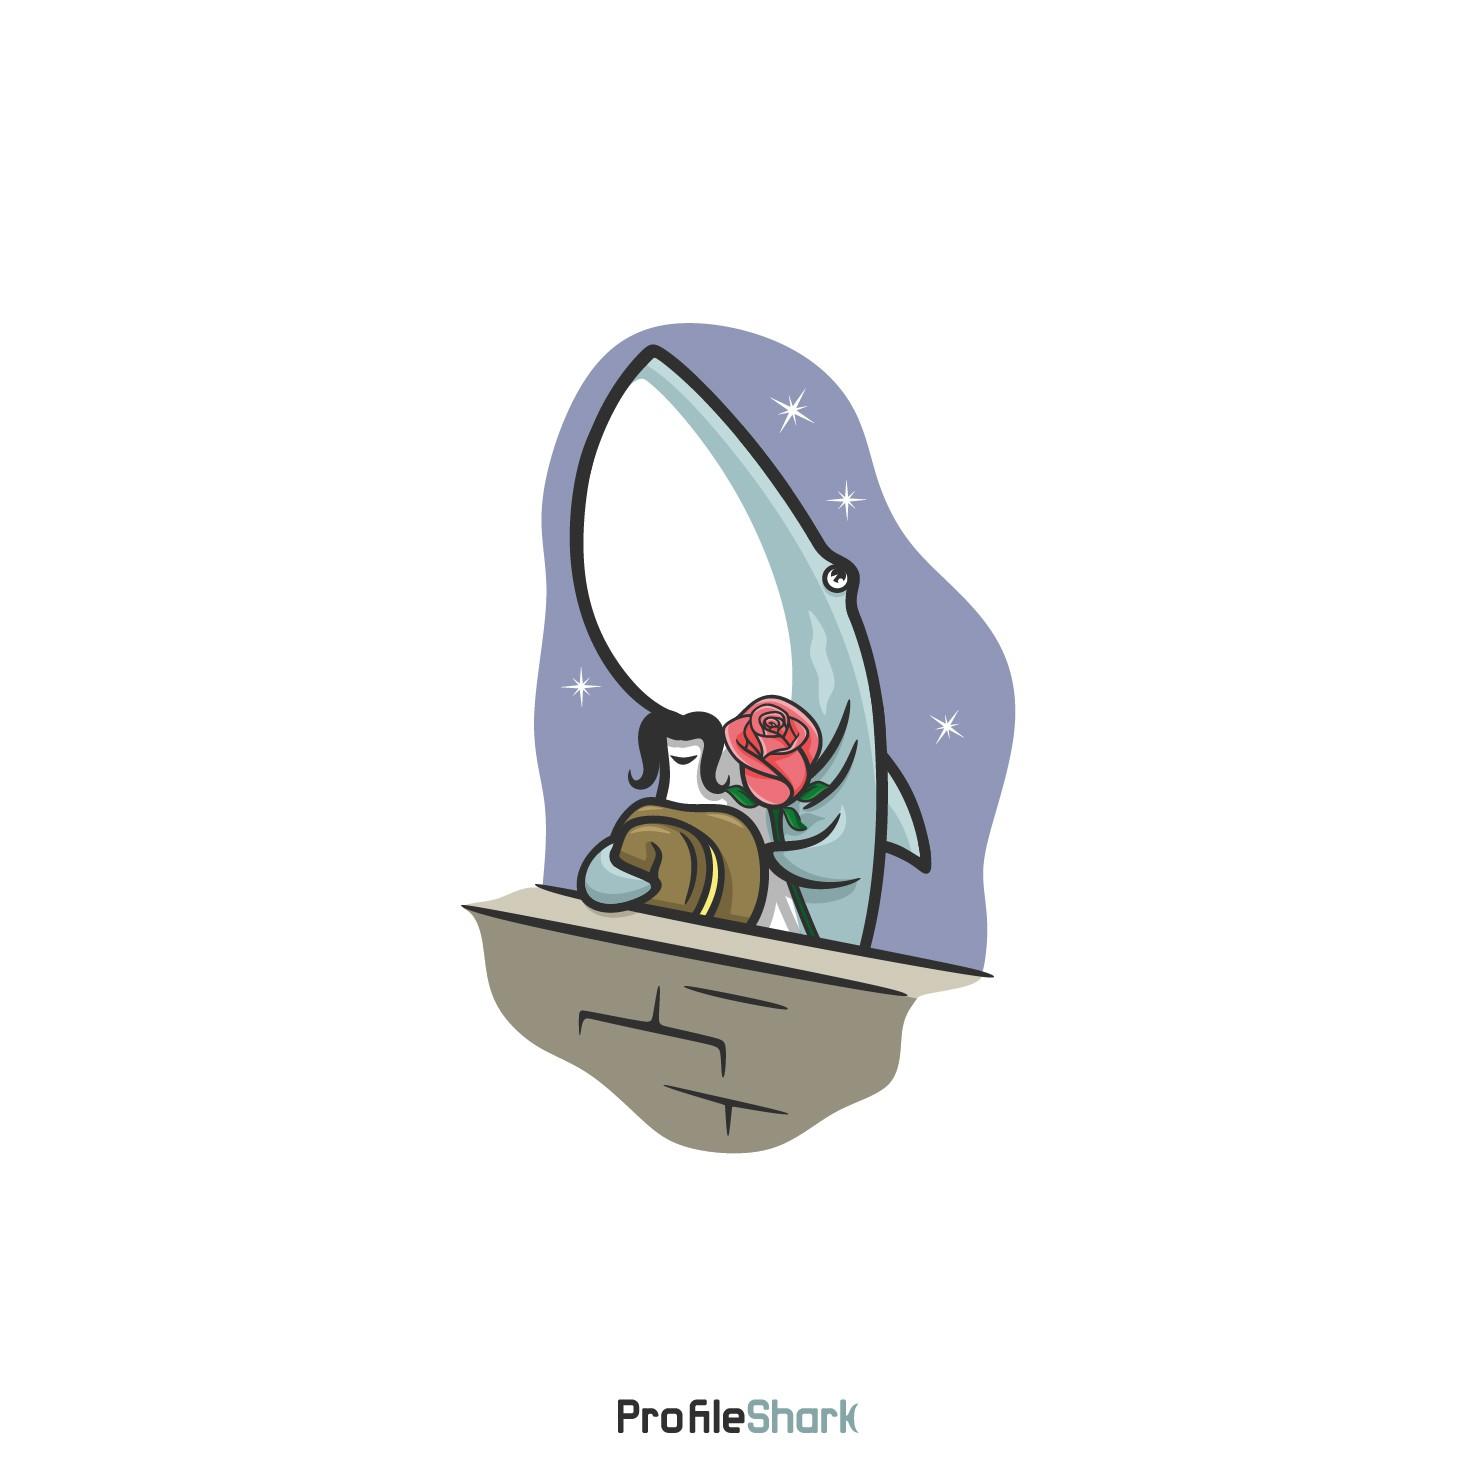 Design a creative, youthful and fun logo for ProfileShark